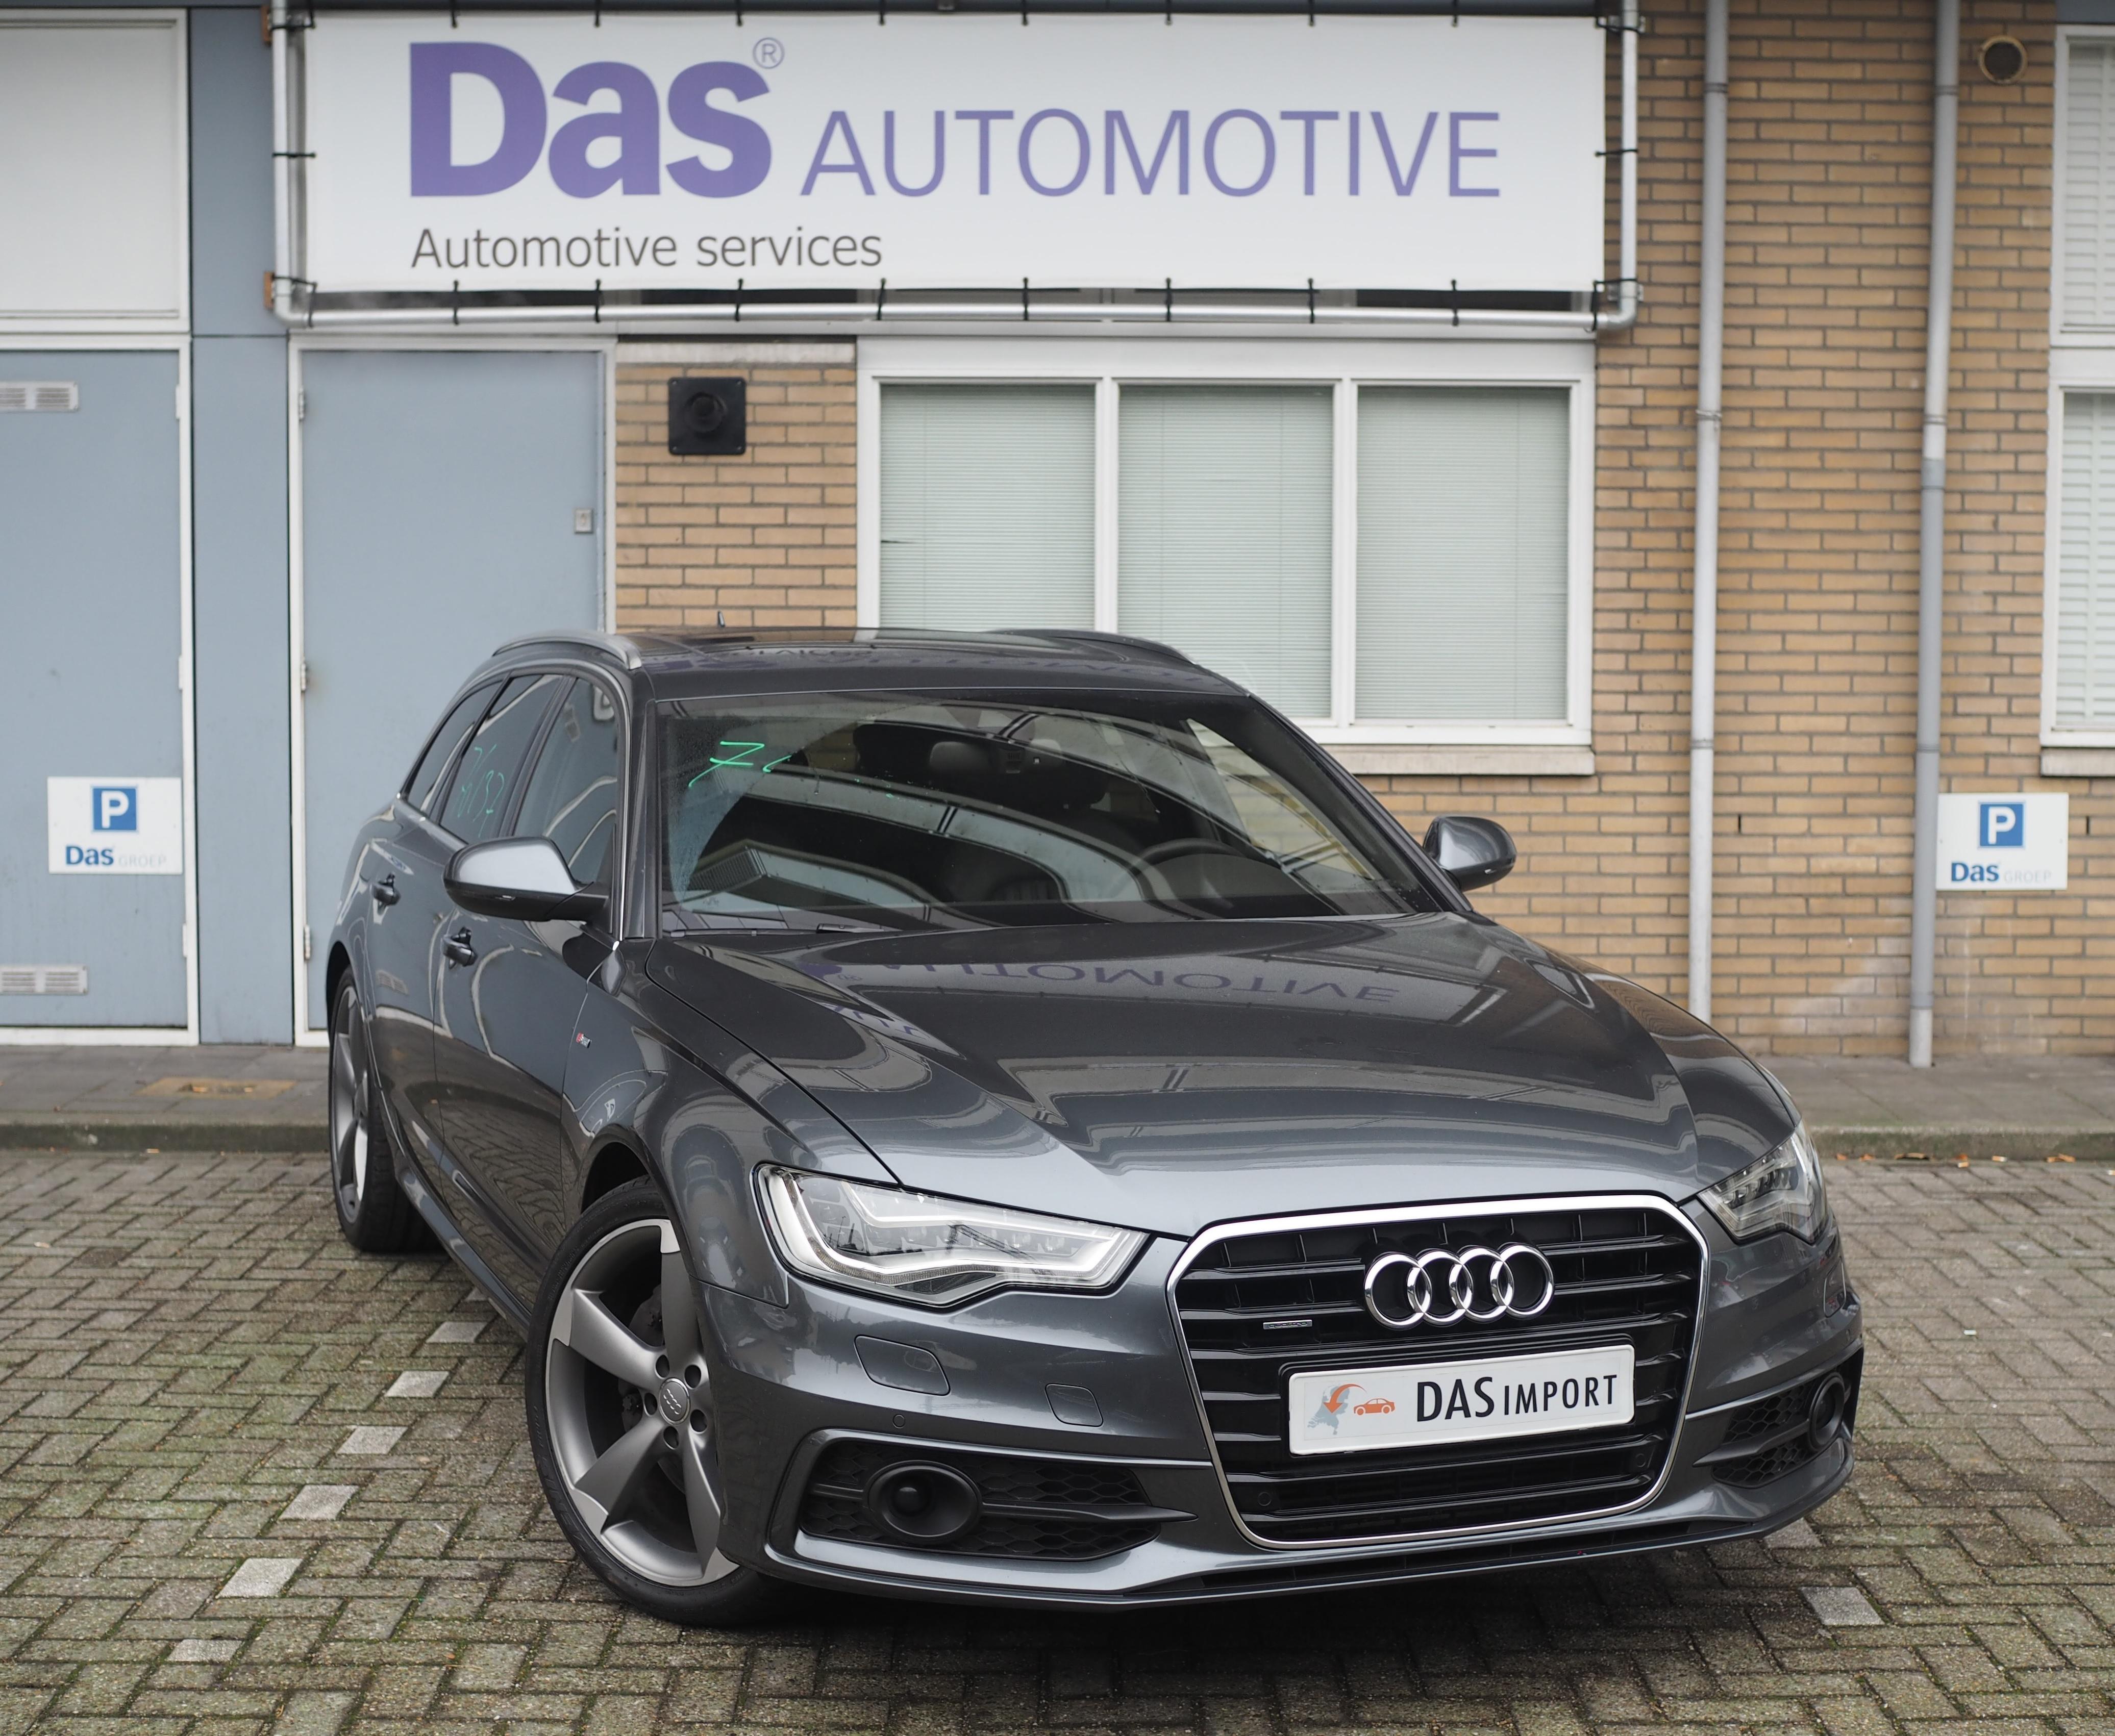 Importauto: Audi A6 Avant 3.0 TDI 245pk quattro 12/2013